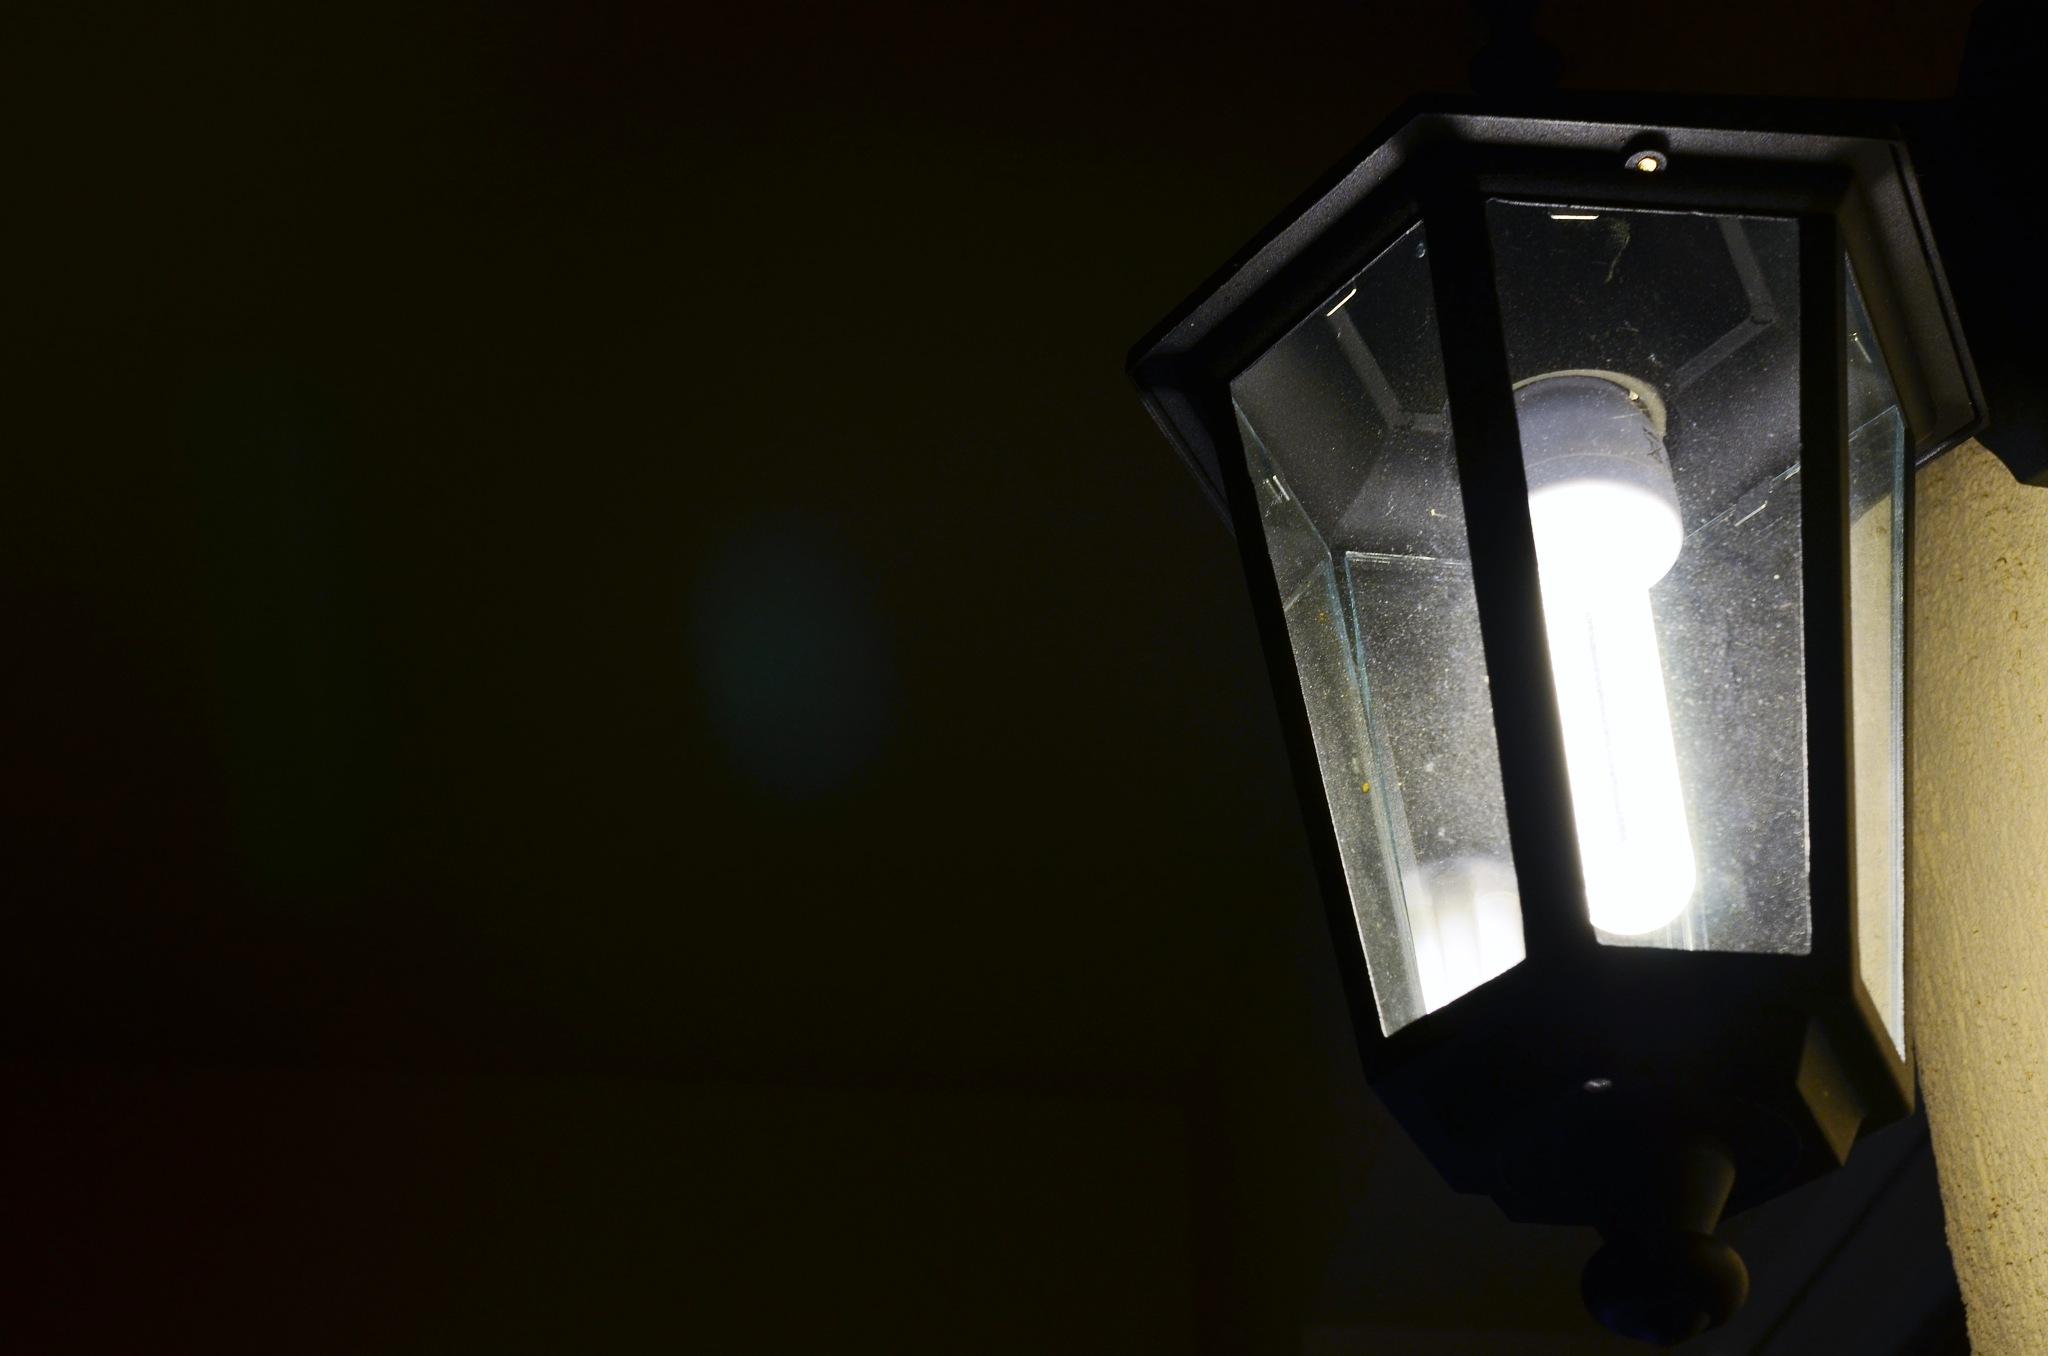 Let there be light! by Dombora Sándor